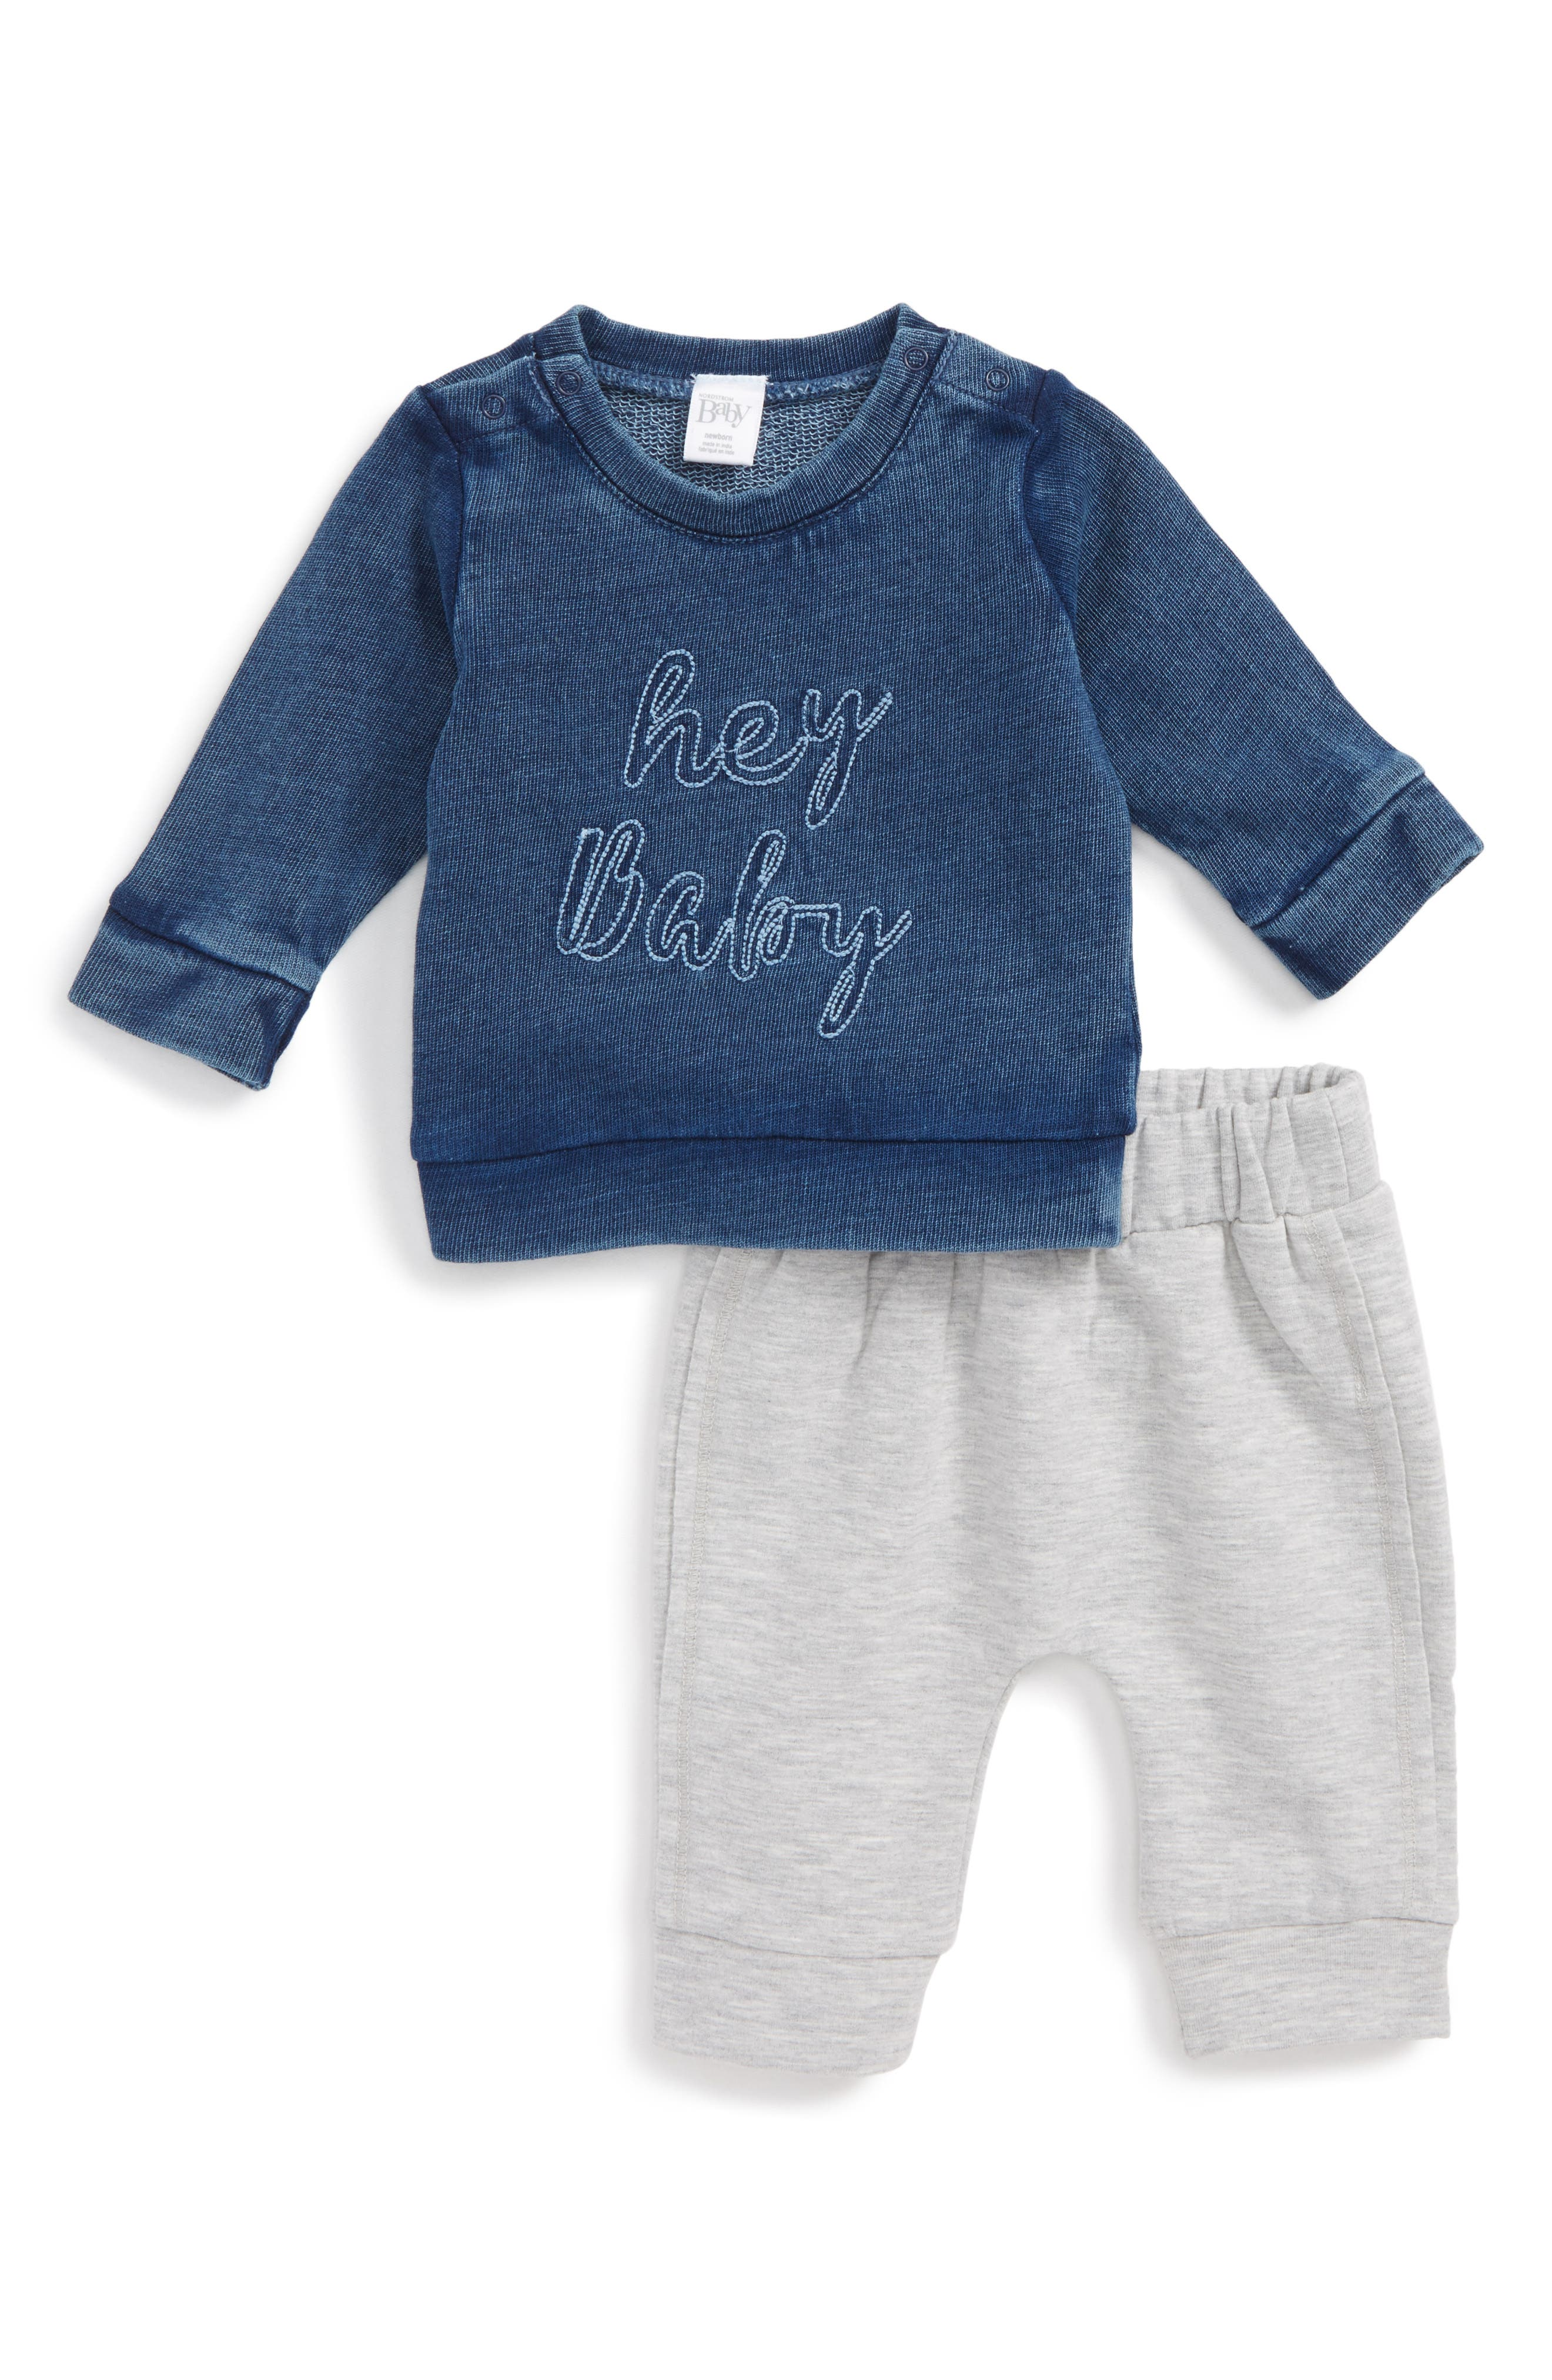 Nordstrom Baby Sweatshirt & Sweatpants Set (Baby Boys)